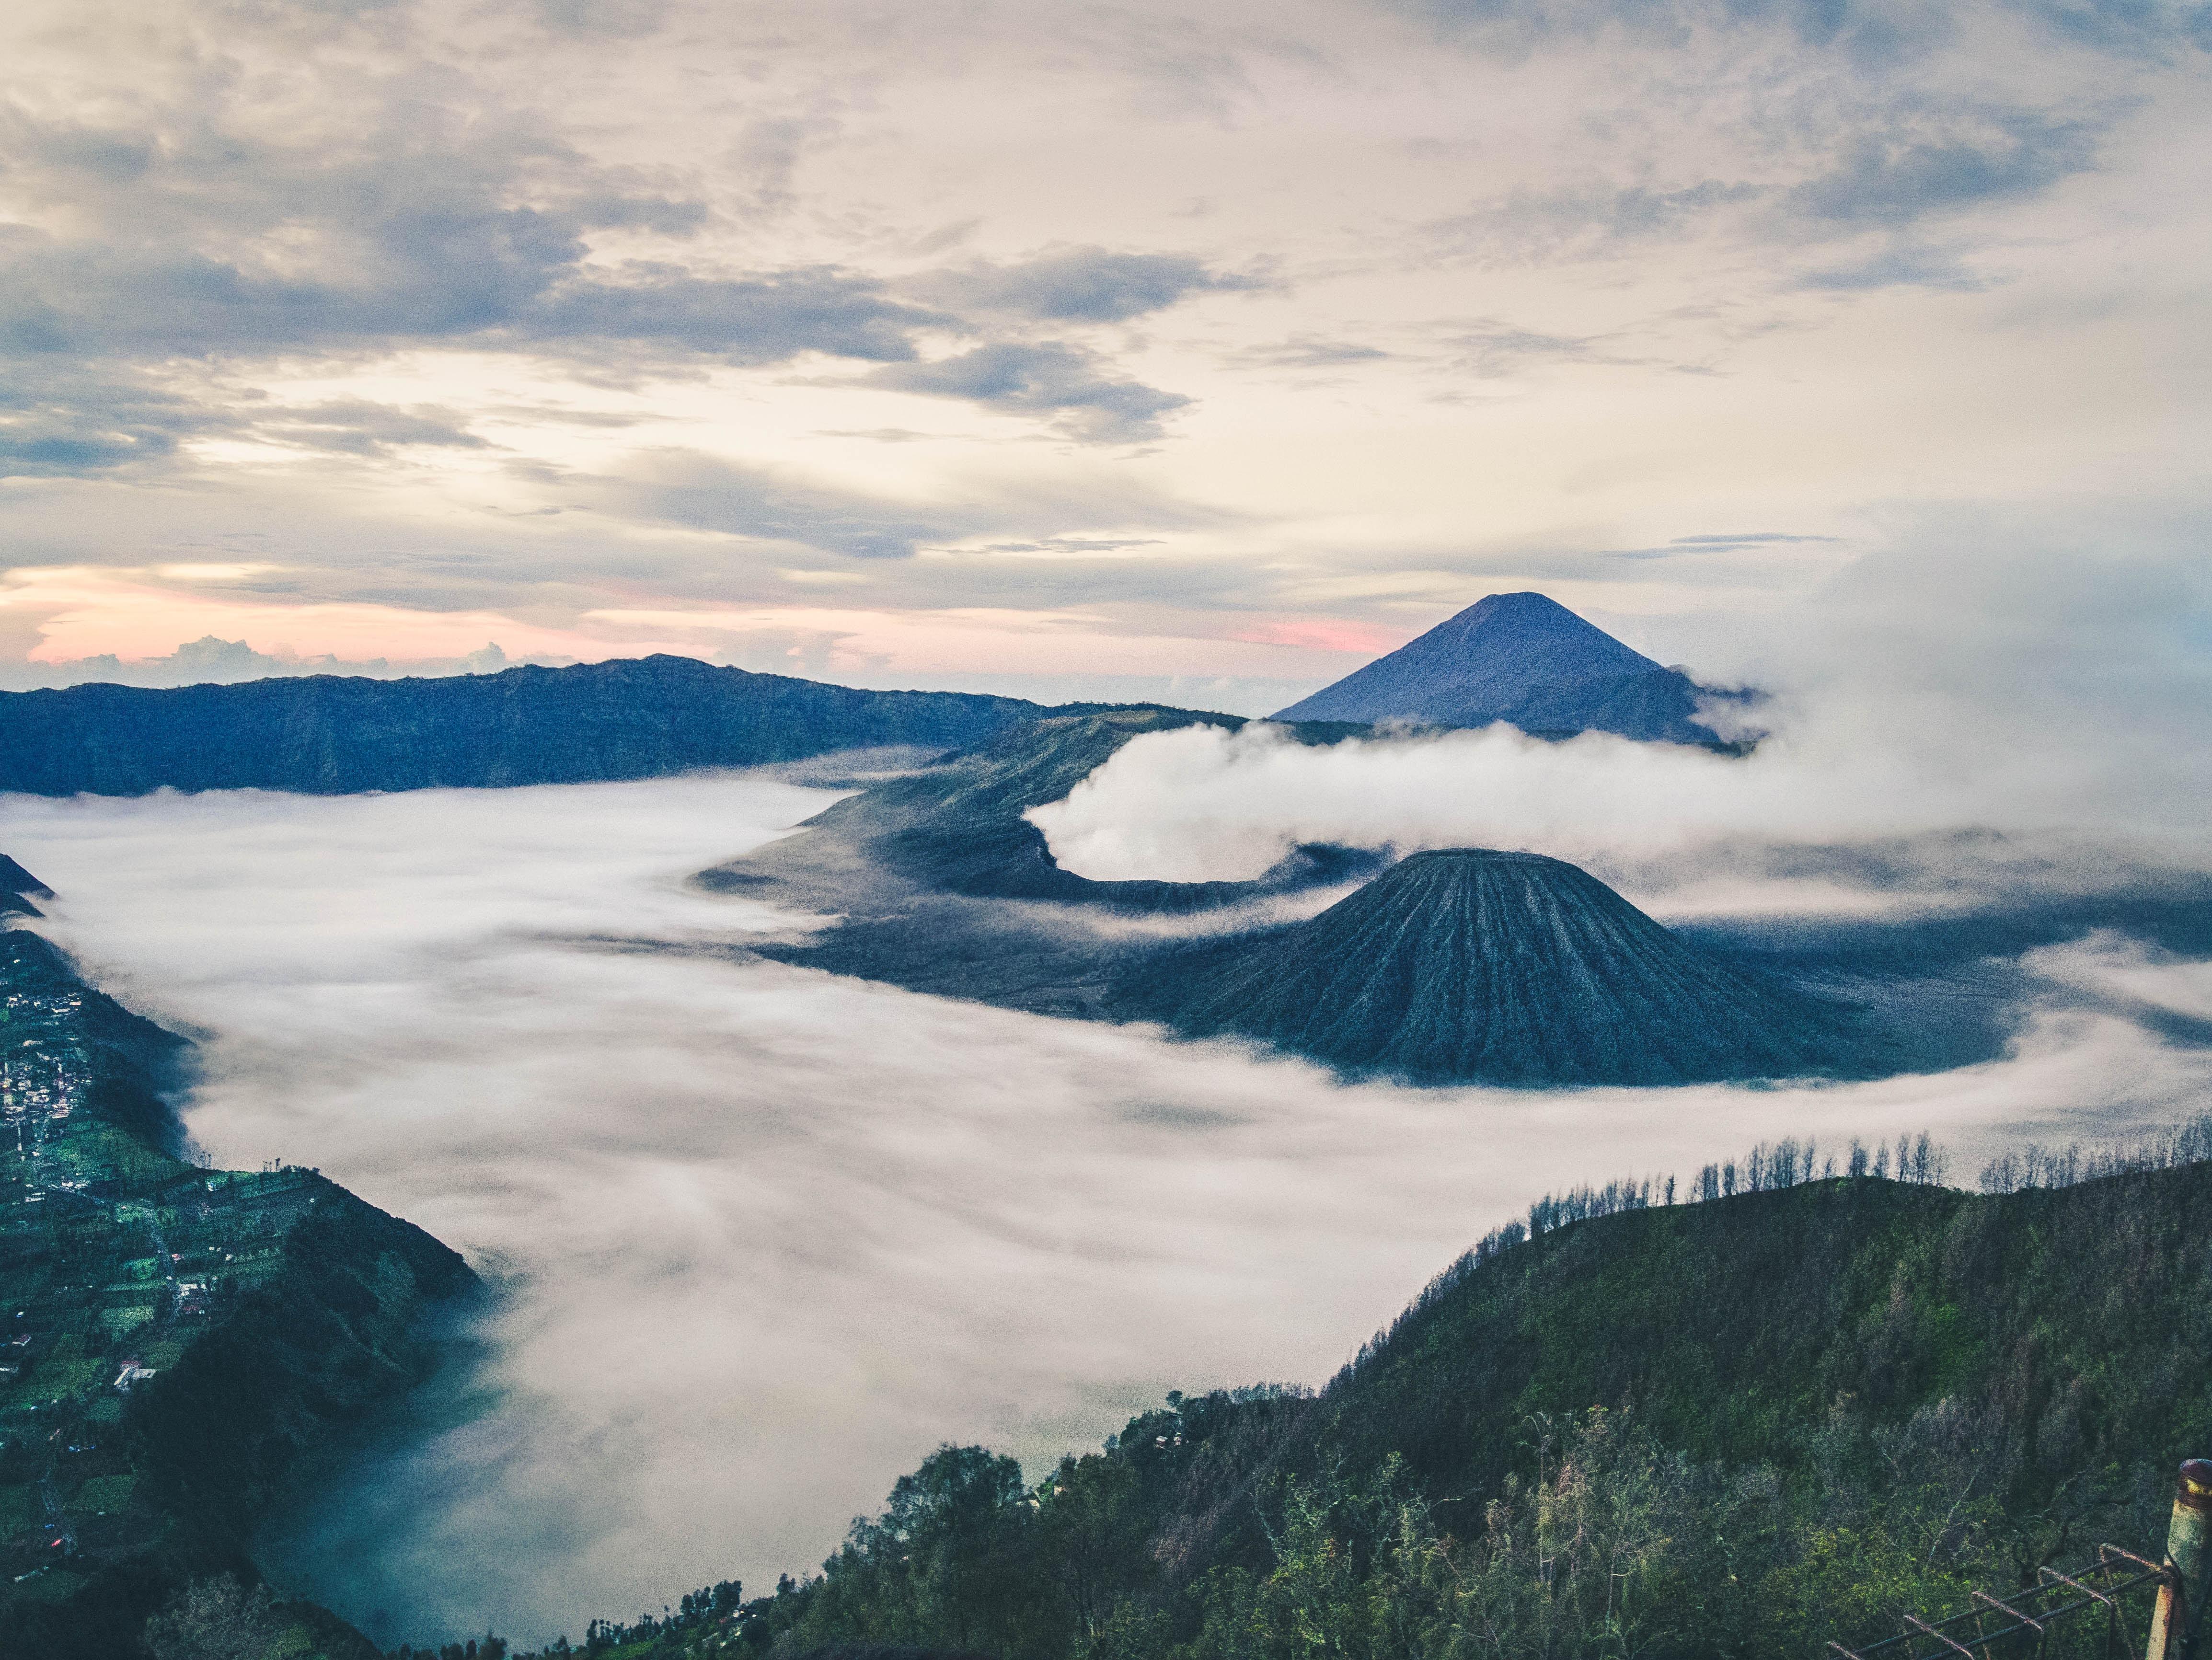 dsndnsdbn: Gunung Bromo Wallpaper